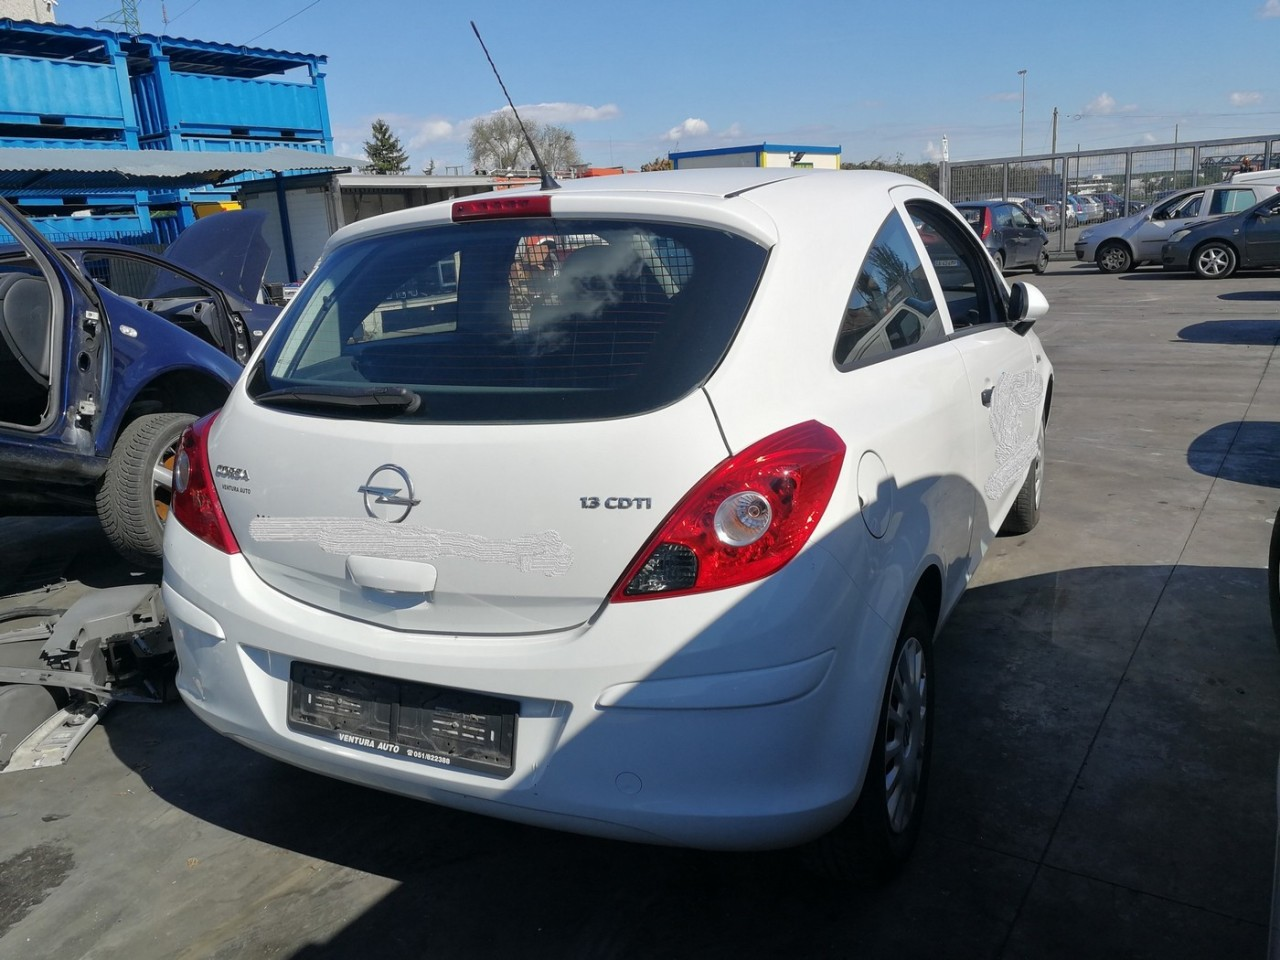 DEZMEMBRARI AUTO / DEZMEMBREZ Opel Corsa D an 2008 - 2009 - 2010 - 2011